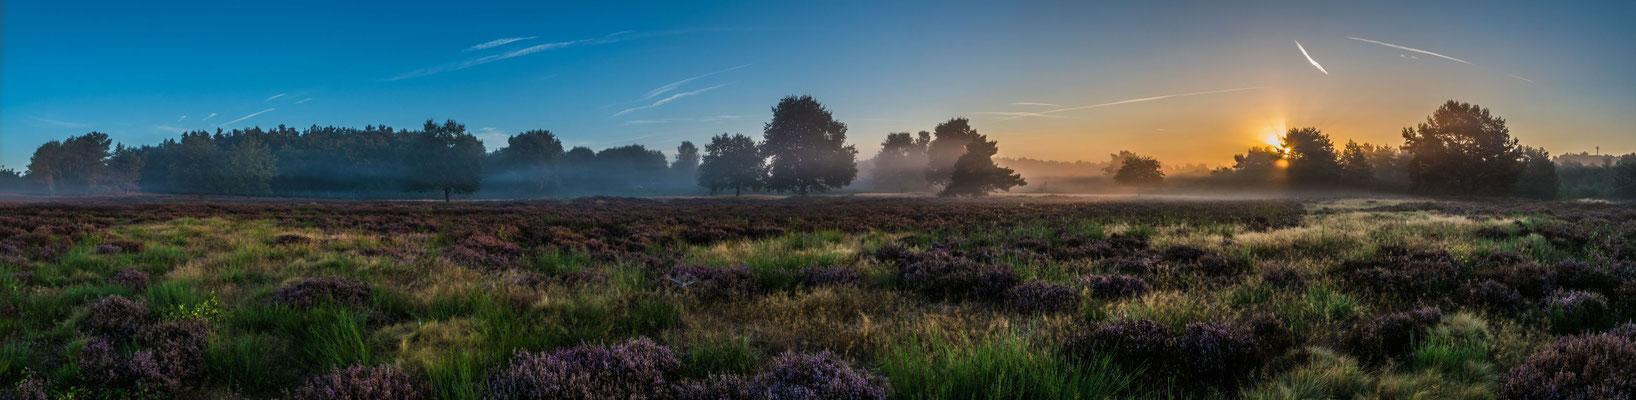 Sonnenaufgang in der Mehlinger Heide